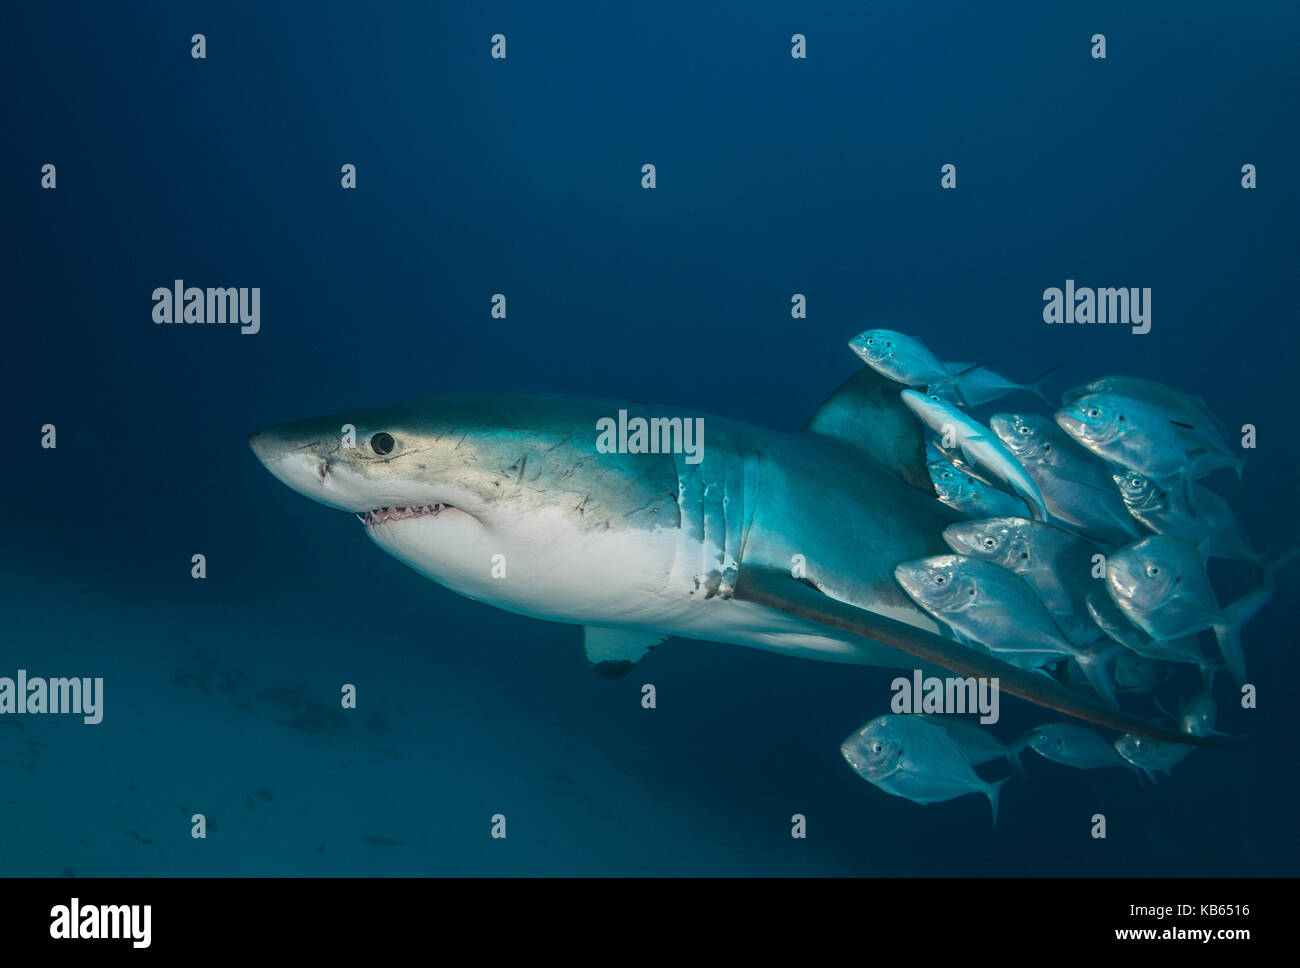 Great white shark and trevally jacks, Neptune islands, South Australia. - Stock Image